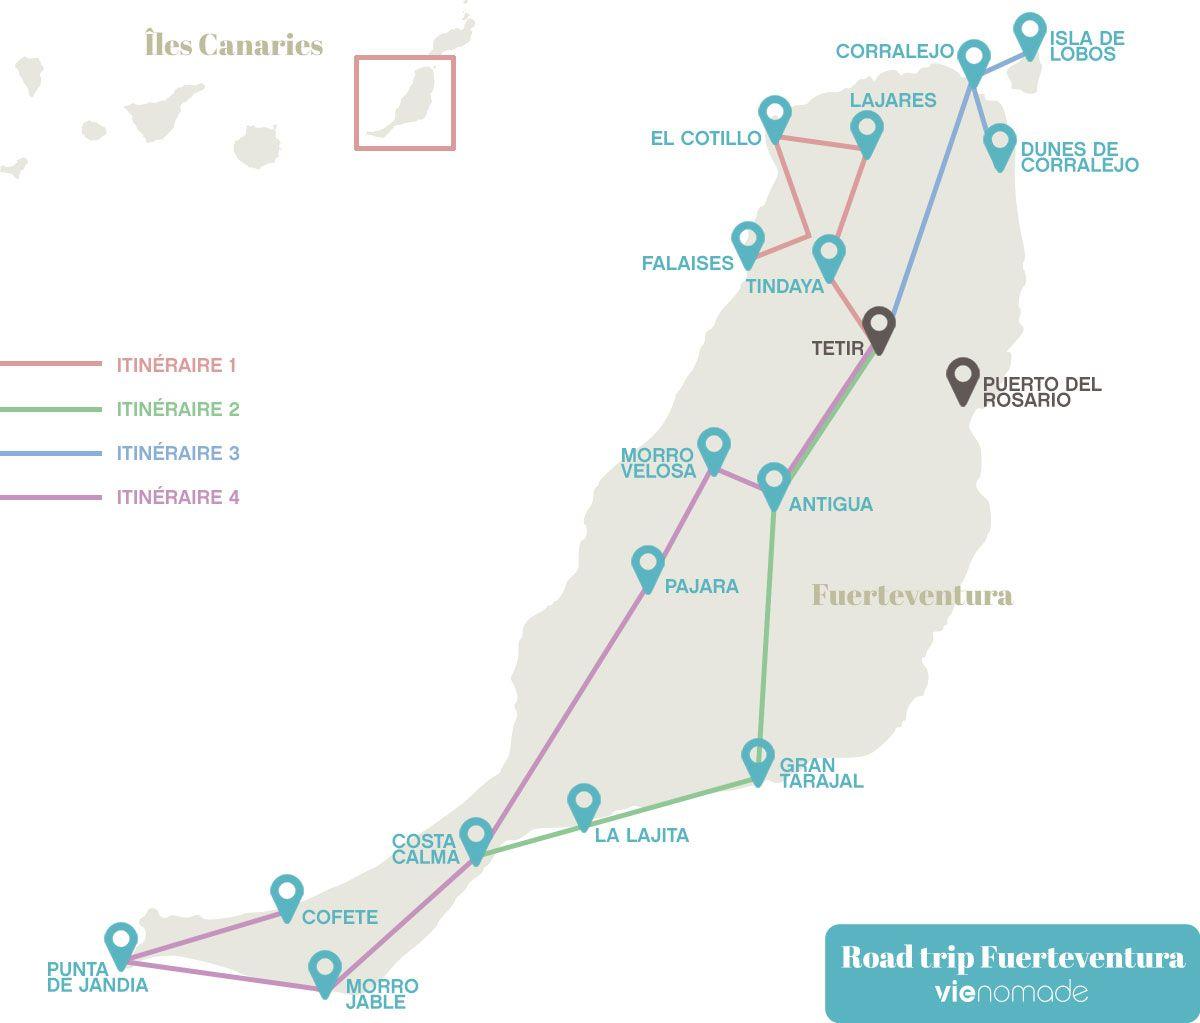 Voyage à Fuerteventura (Canaries): avis et itinéraire | Fuerteventura, Canaries, Iles canaries